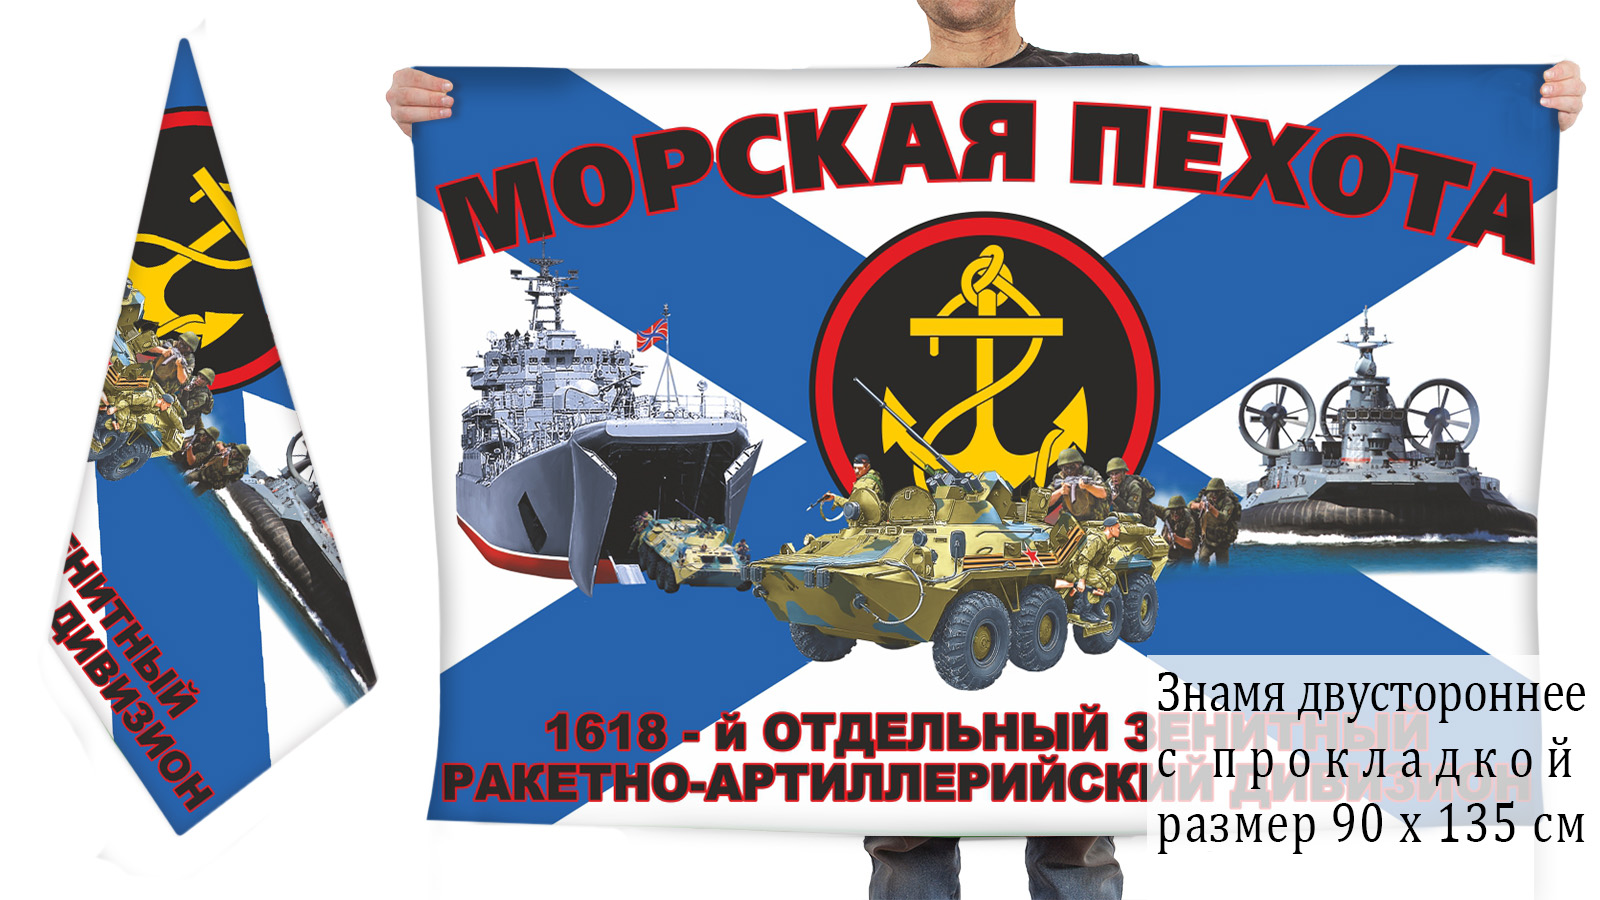 Двусторонний флаг 1618 отдельного зенитного ракетно-артиллерийского дивизиона морпехов